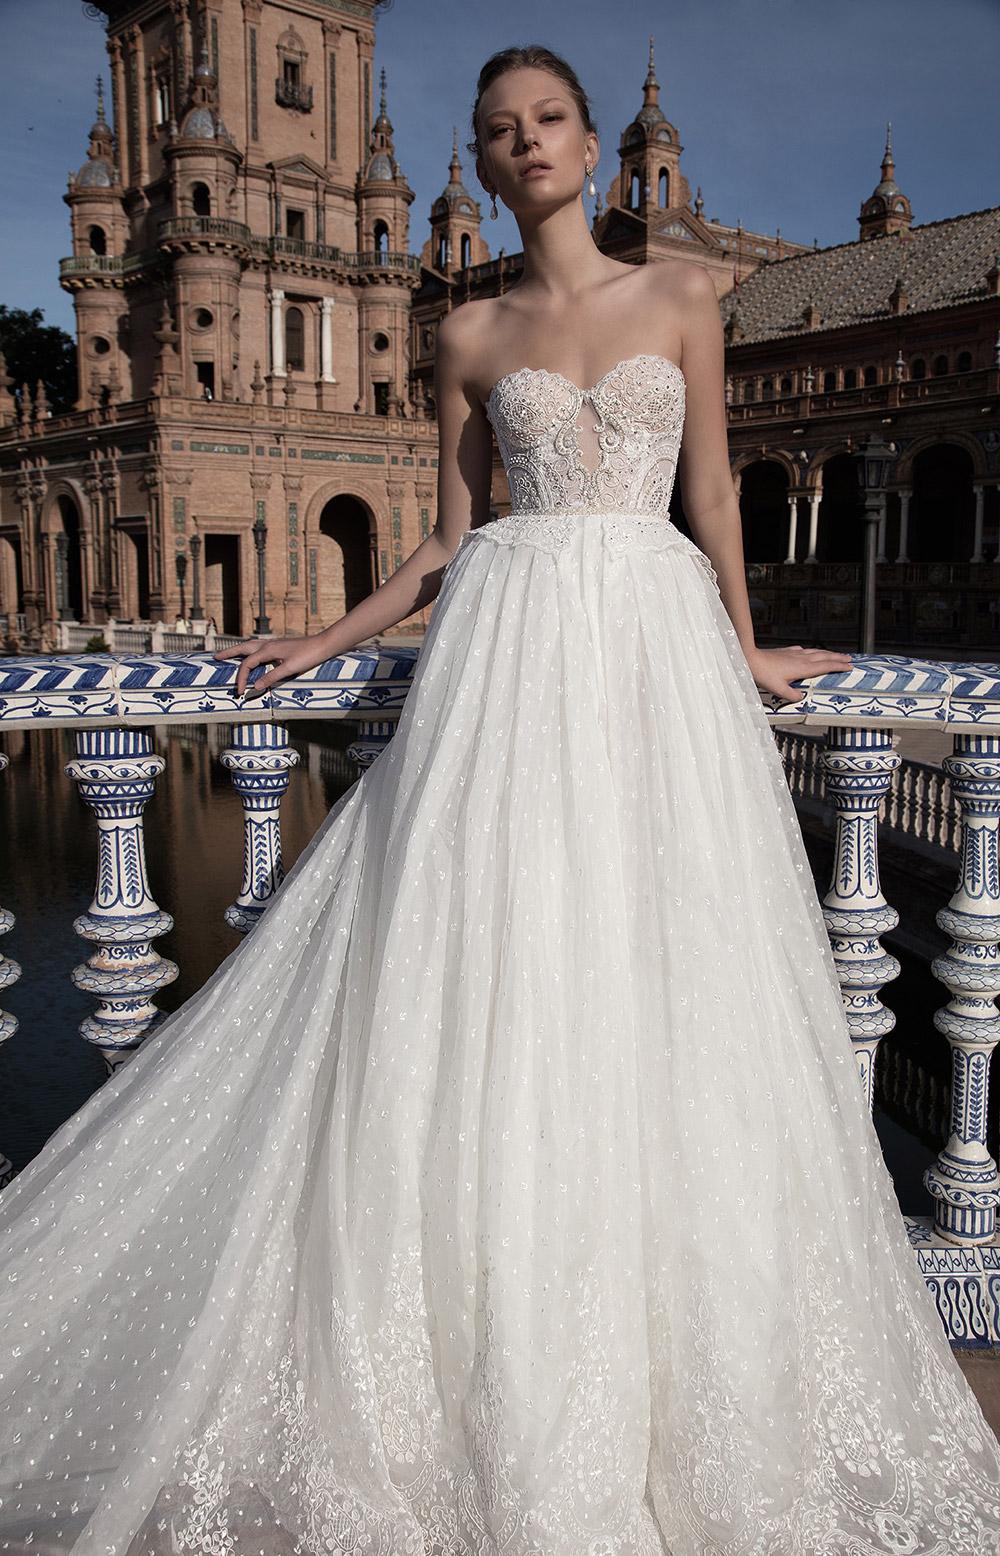 ANASTASIA - Alon Livne 2017 Bridal Collection. www.theweddingnotebook.com